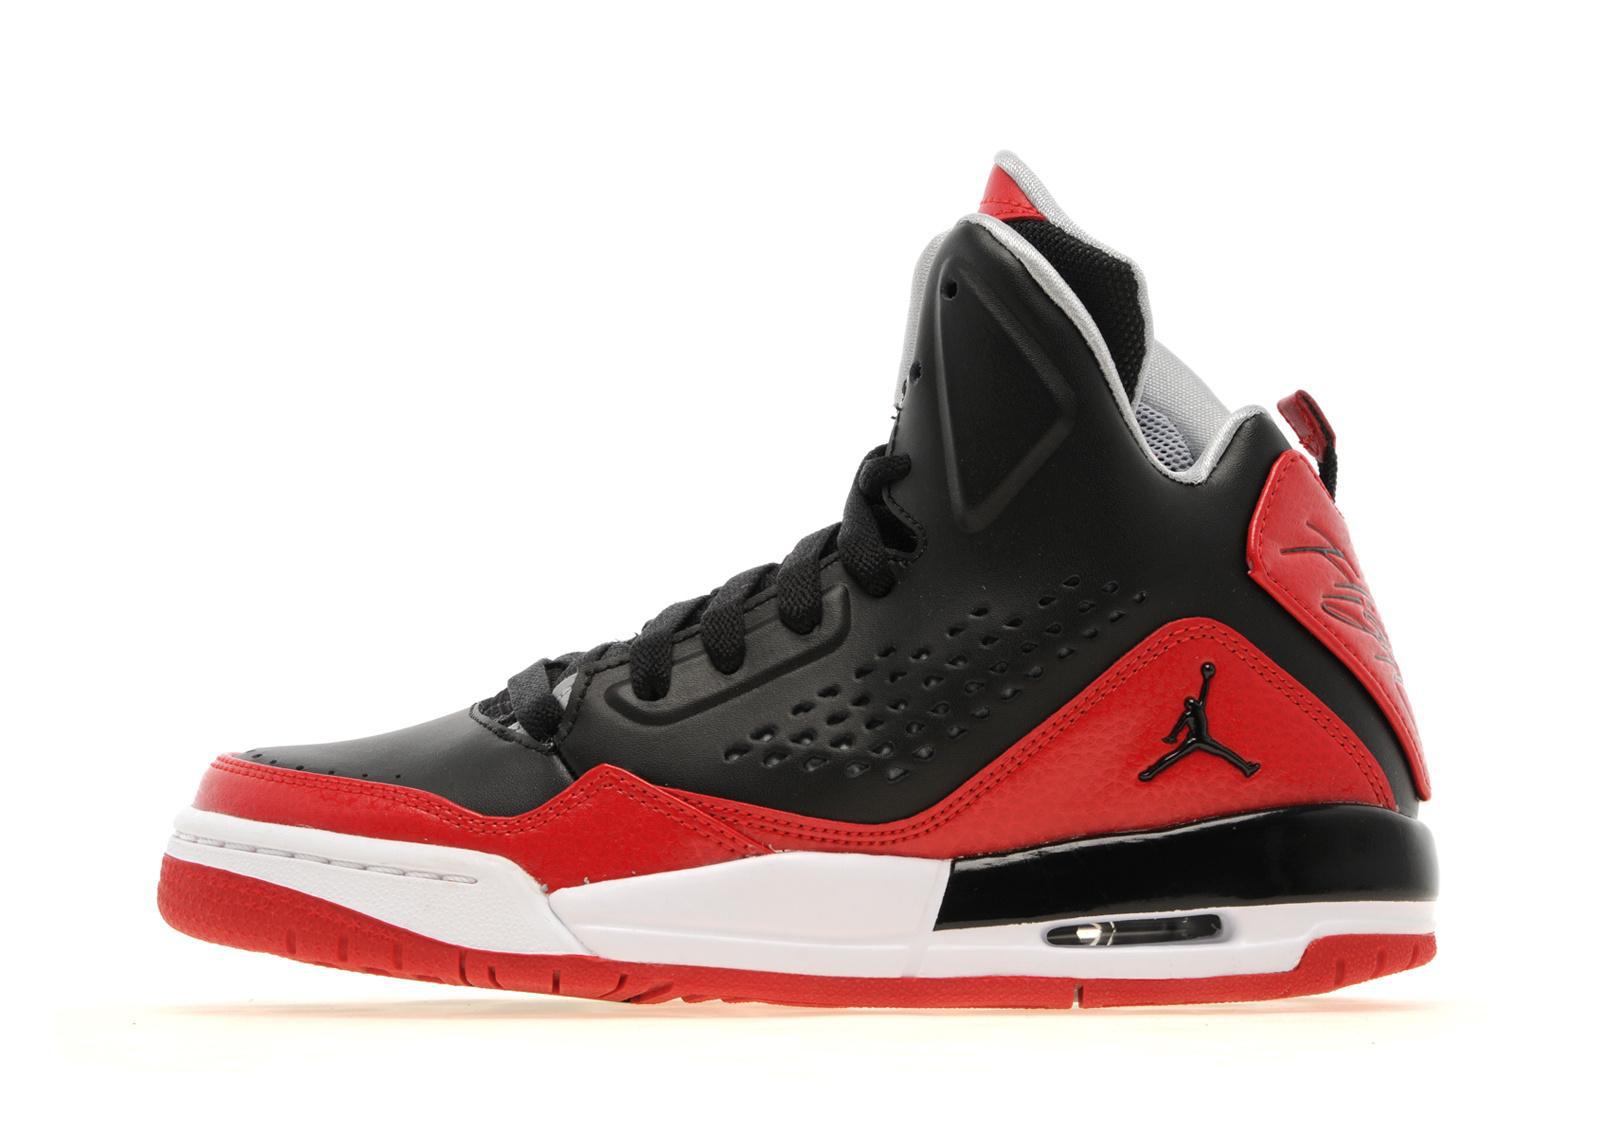 Baskets Nike Jordan SC-3 Junior (35.5 > 38.5)